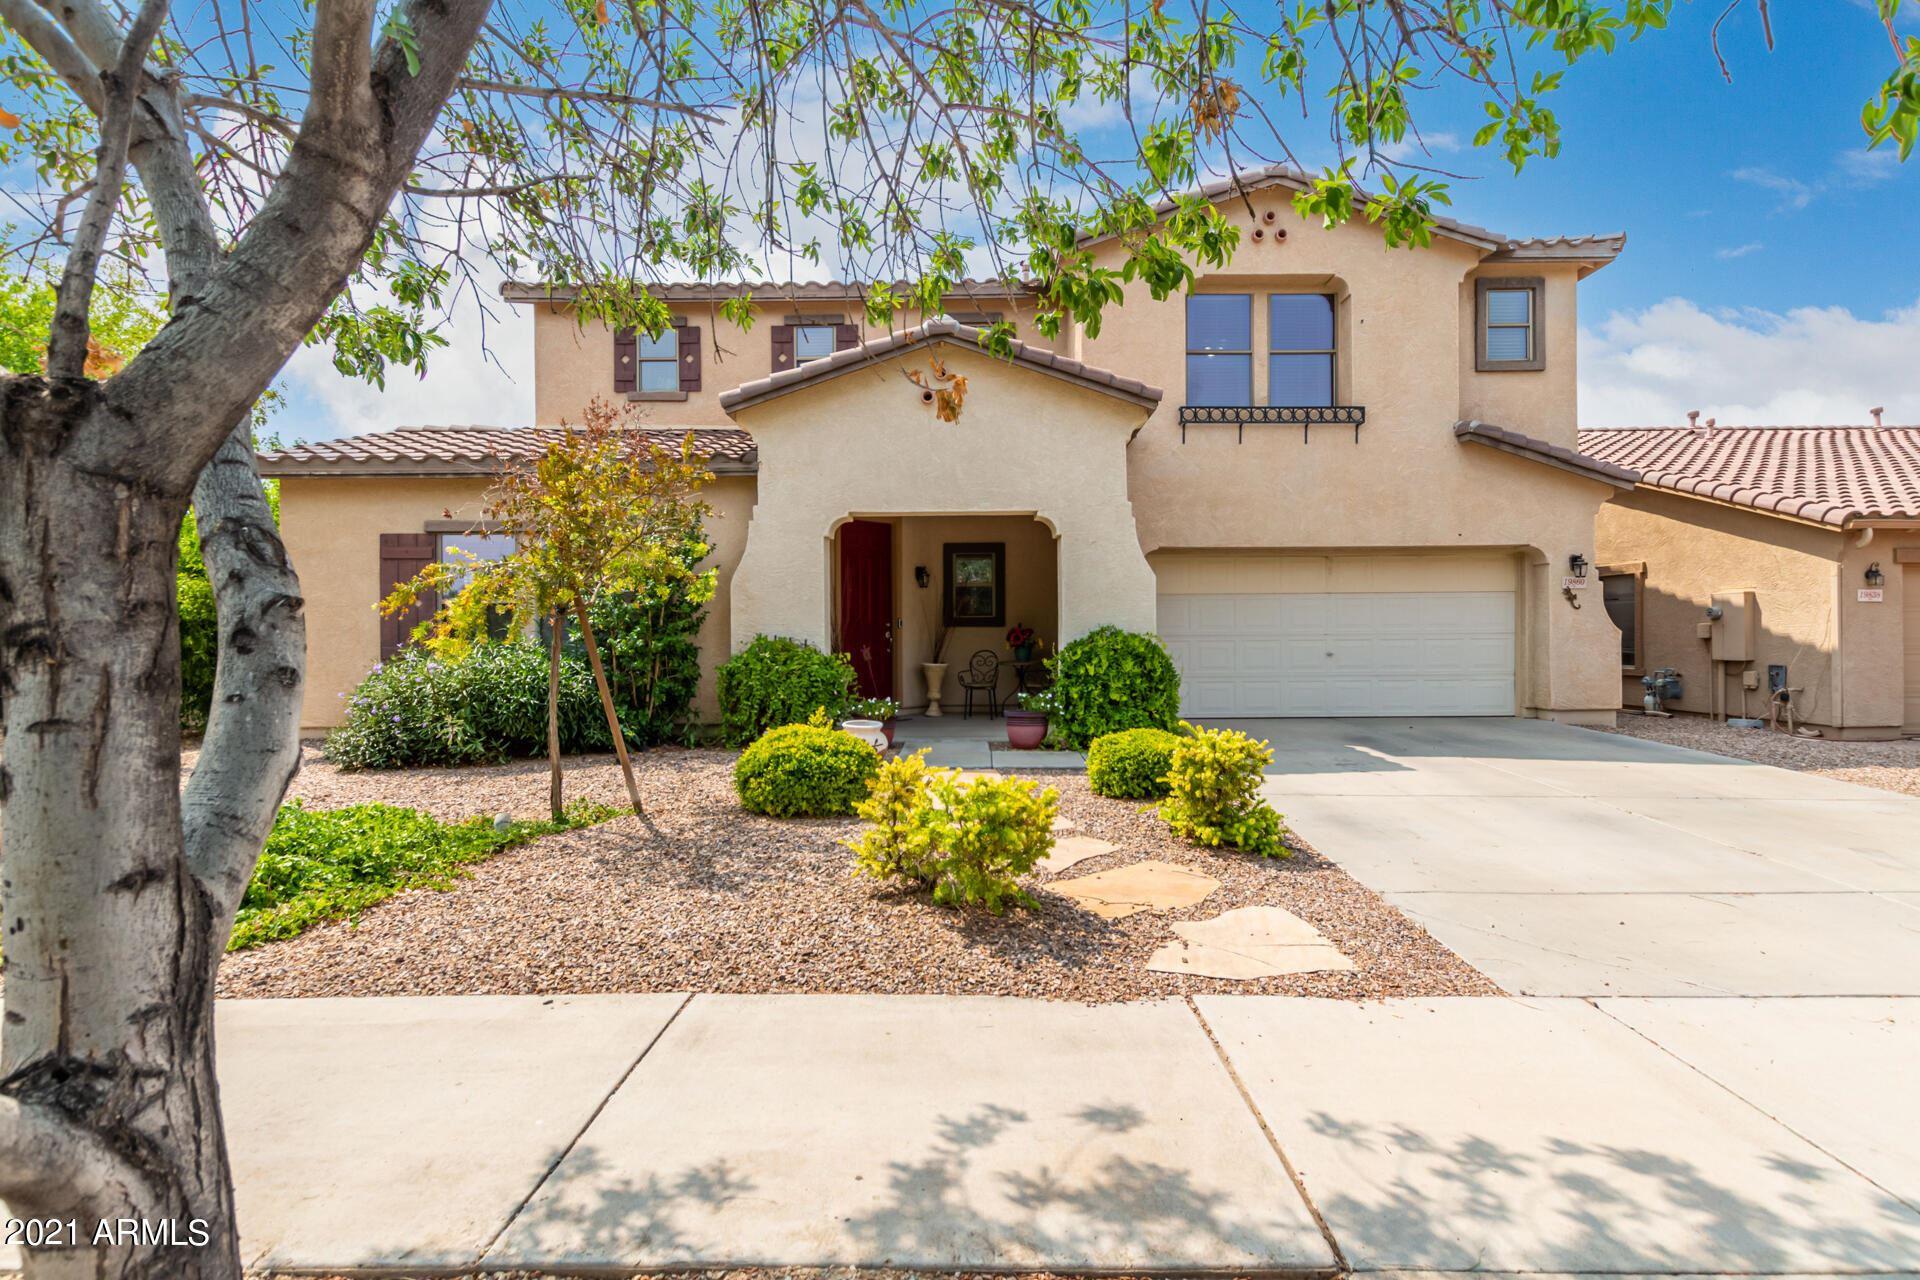 19860 S 198th Street, Queen Creek, AZ 85142 - MLS#: 6268883